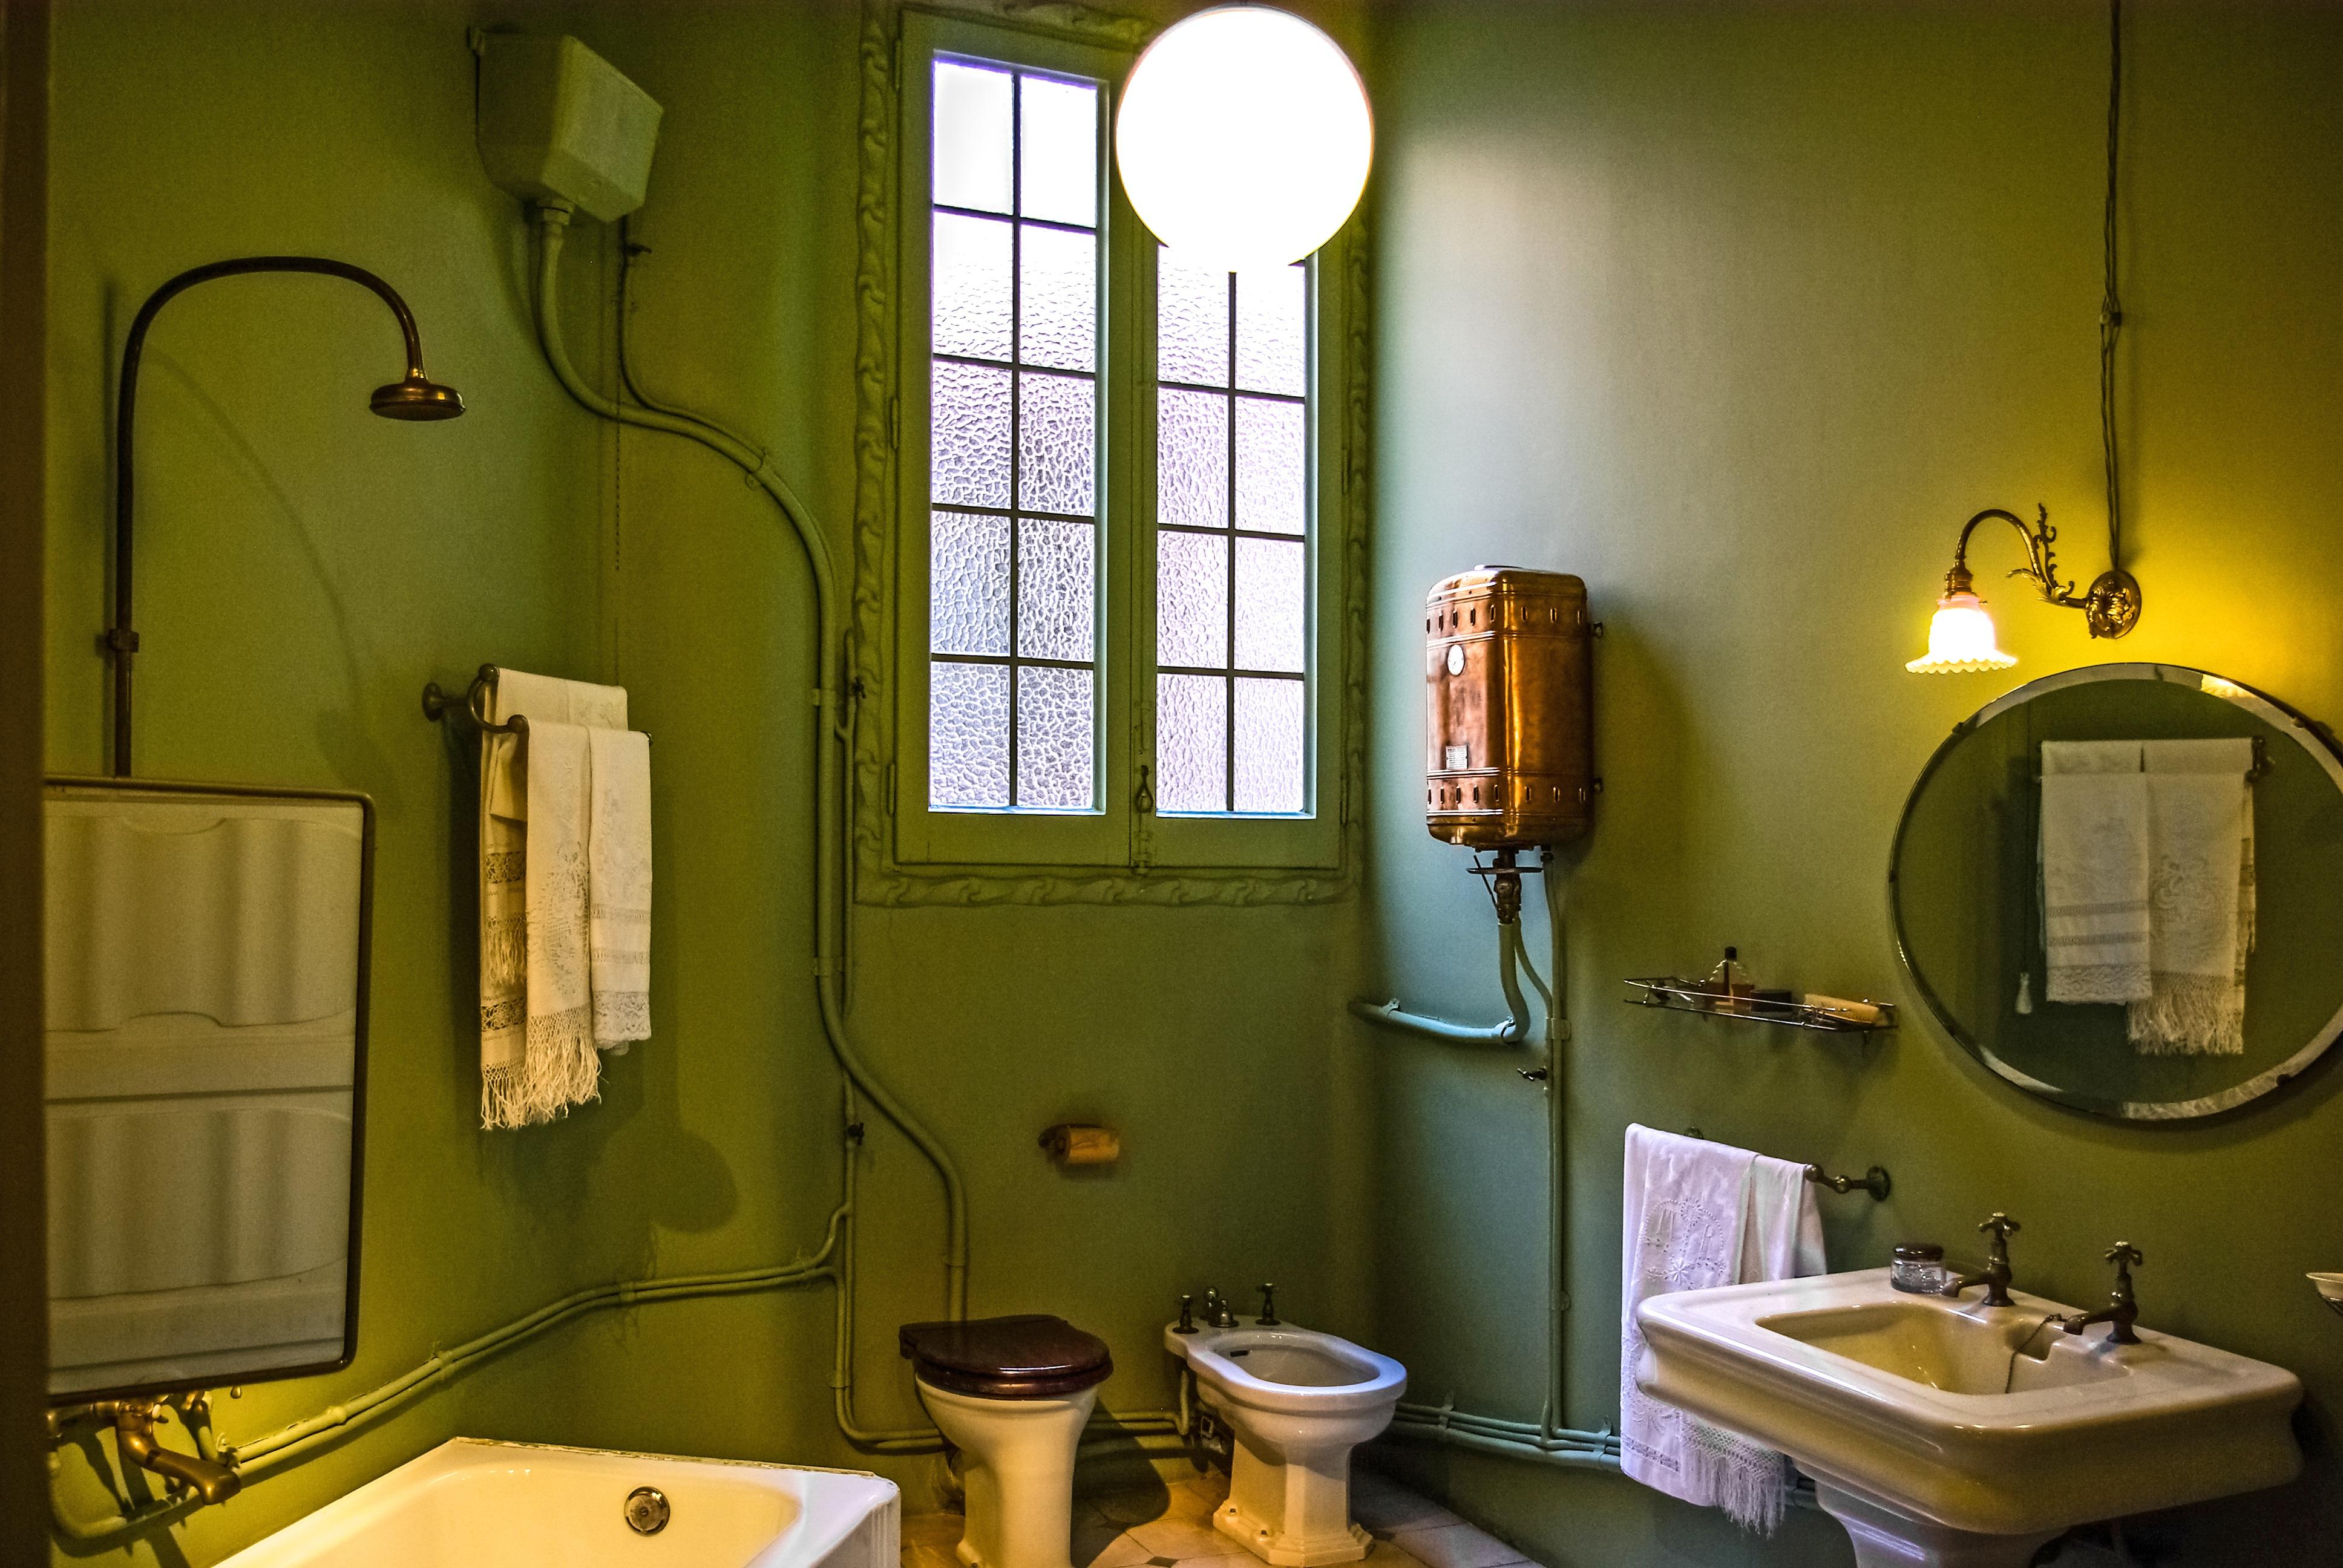 Fotos gratis : arquitectura, casa, interior, ventana, habitación ...